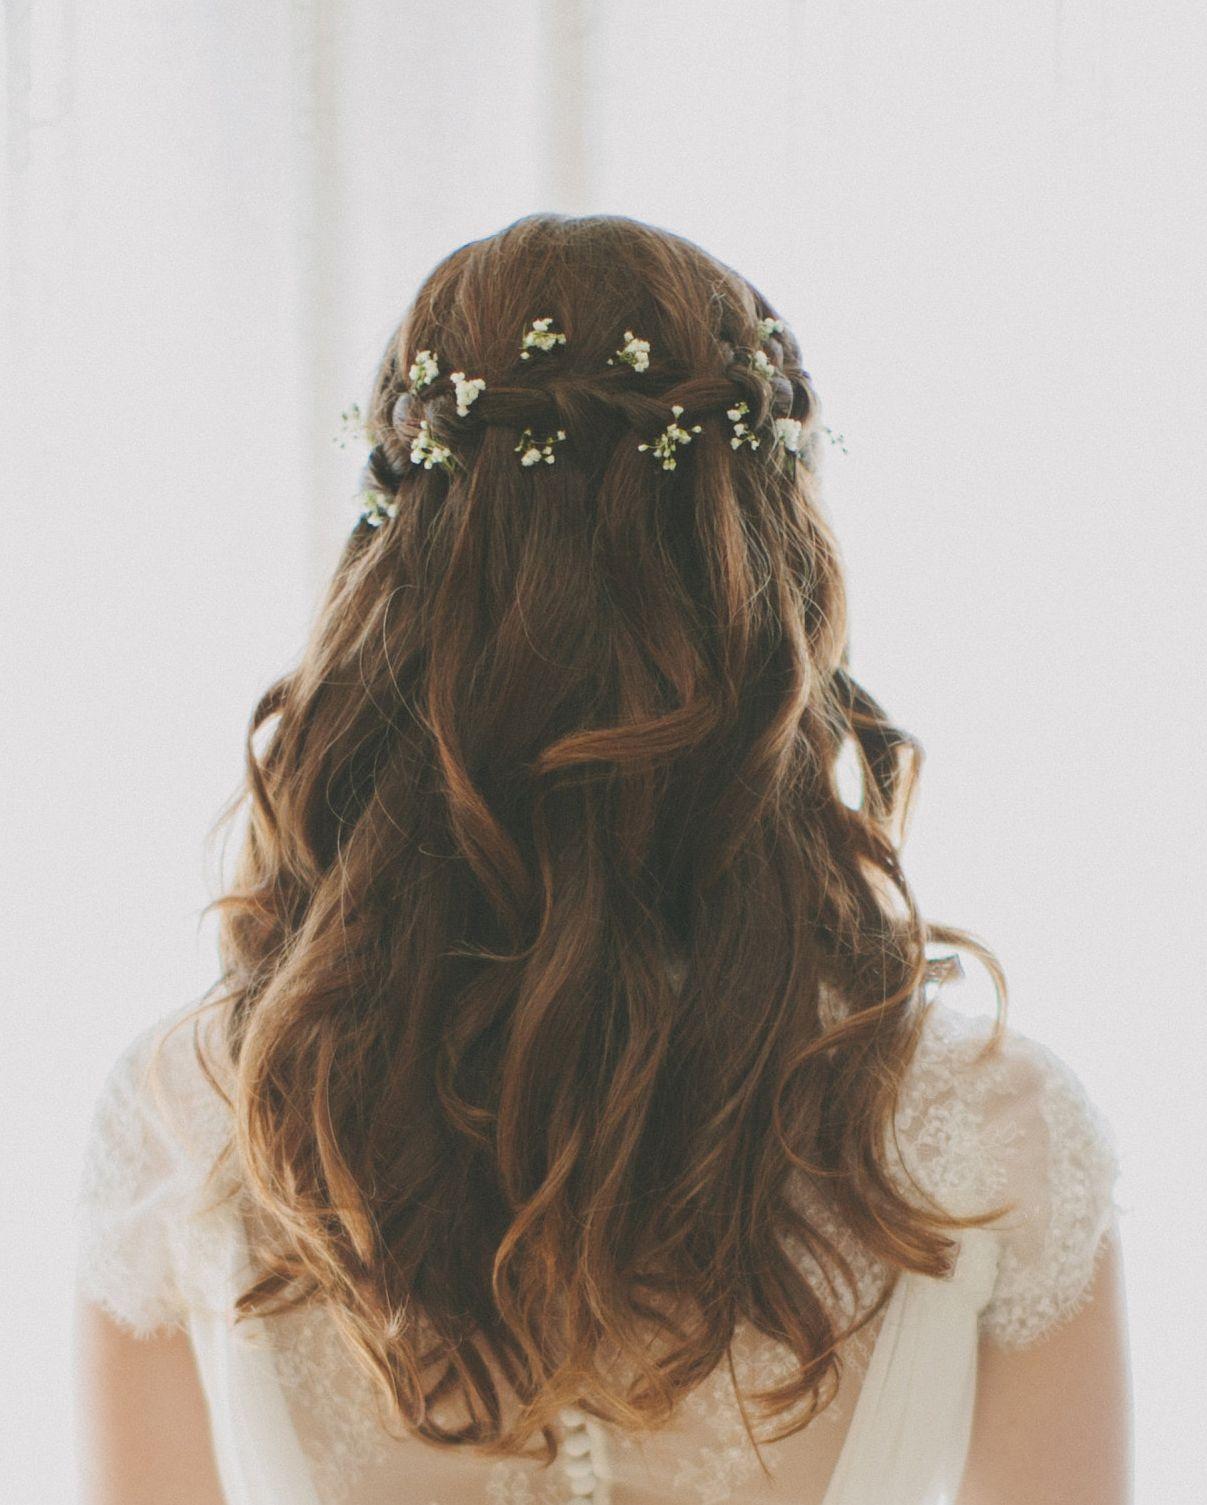 Waterfall braid wedding hair with baby\'s breath | Dresses ...